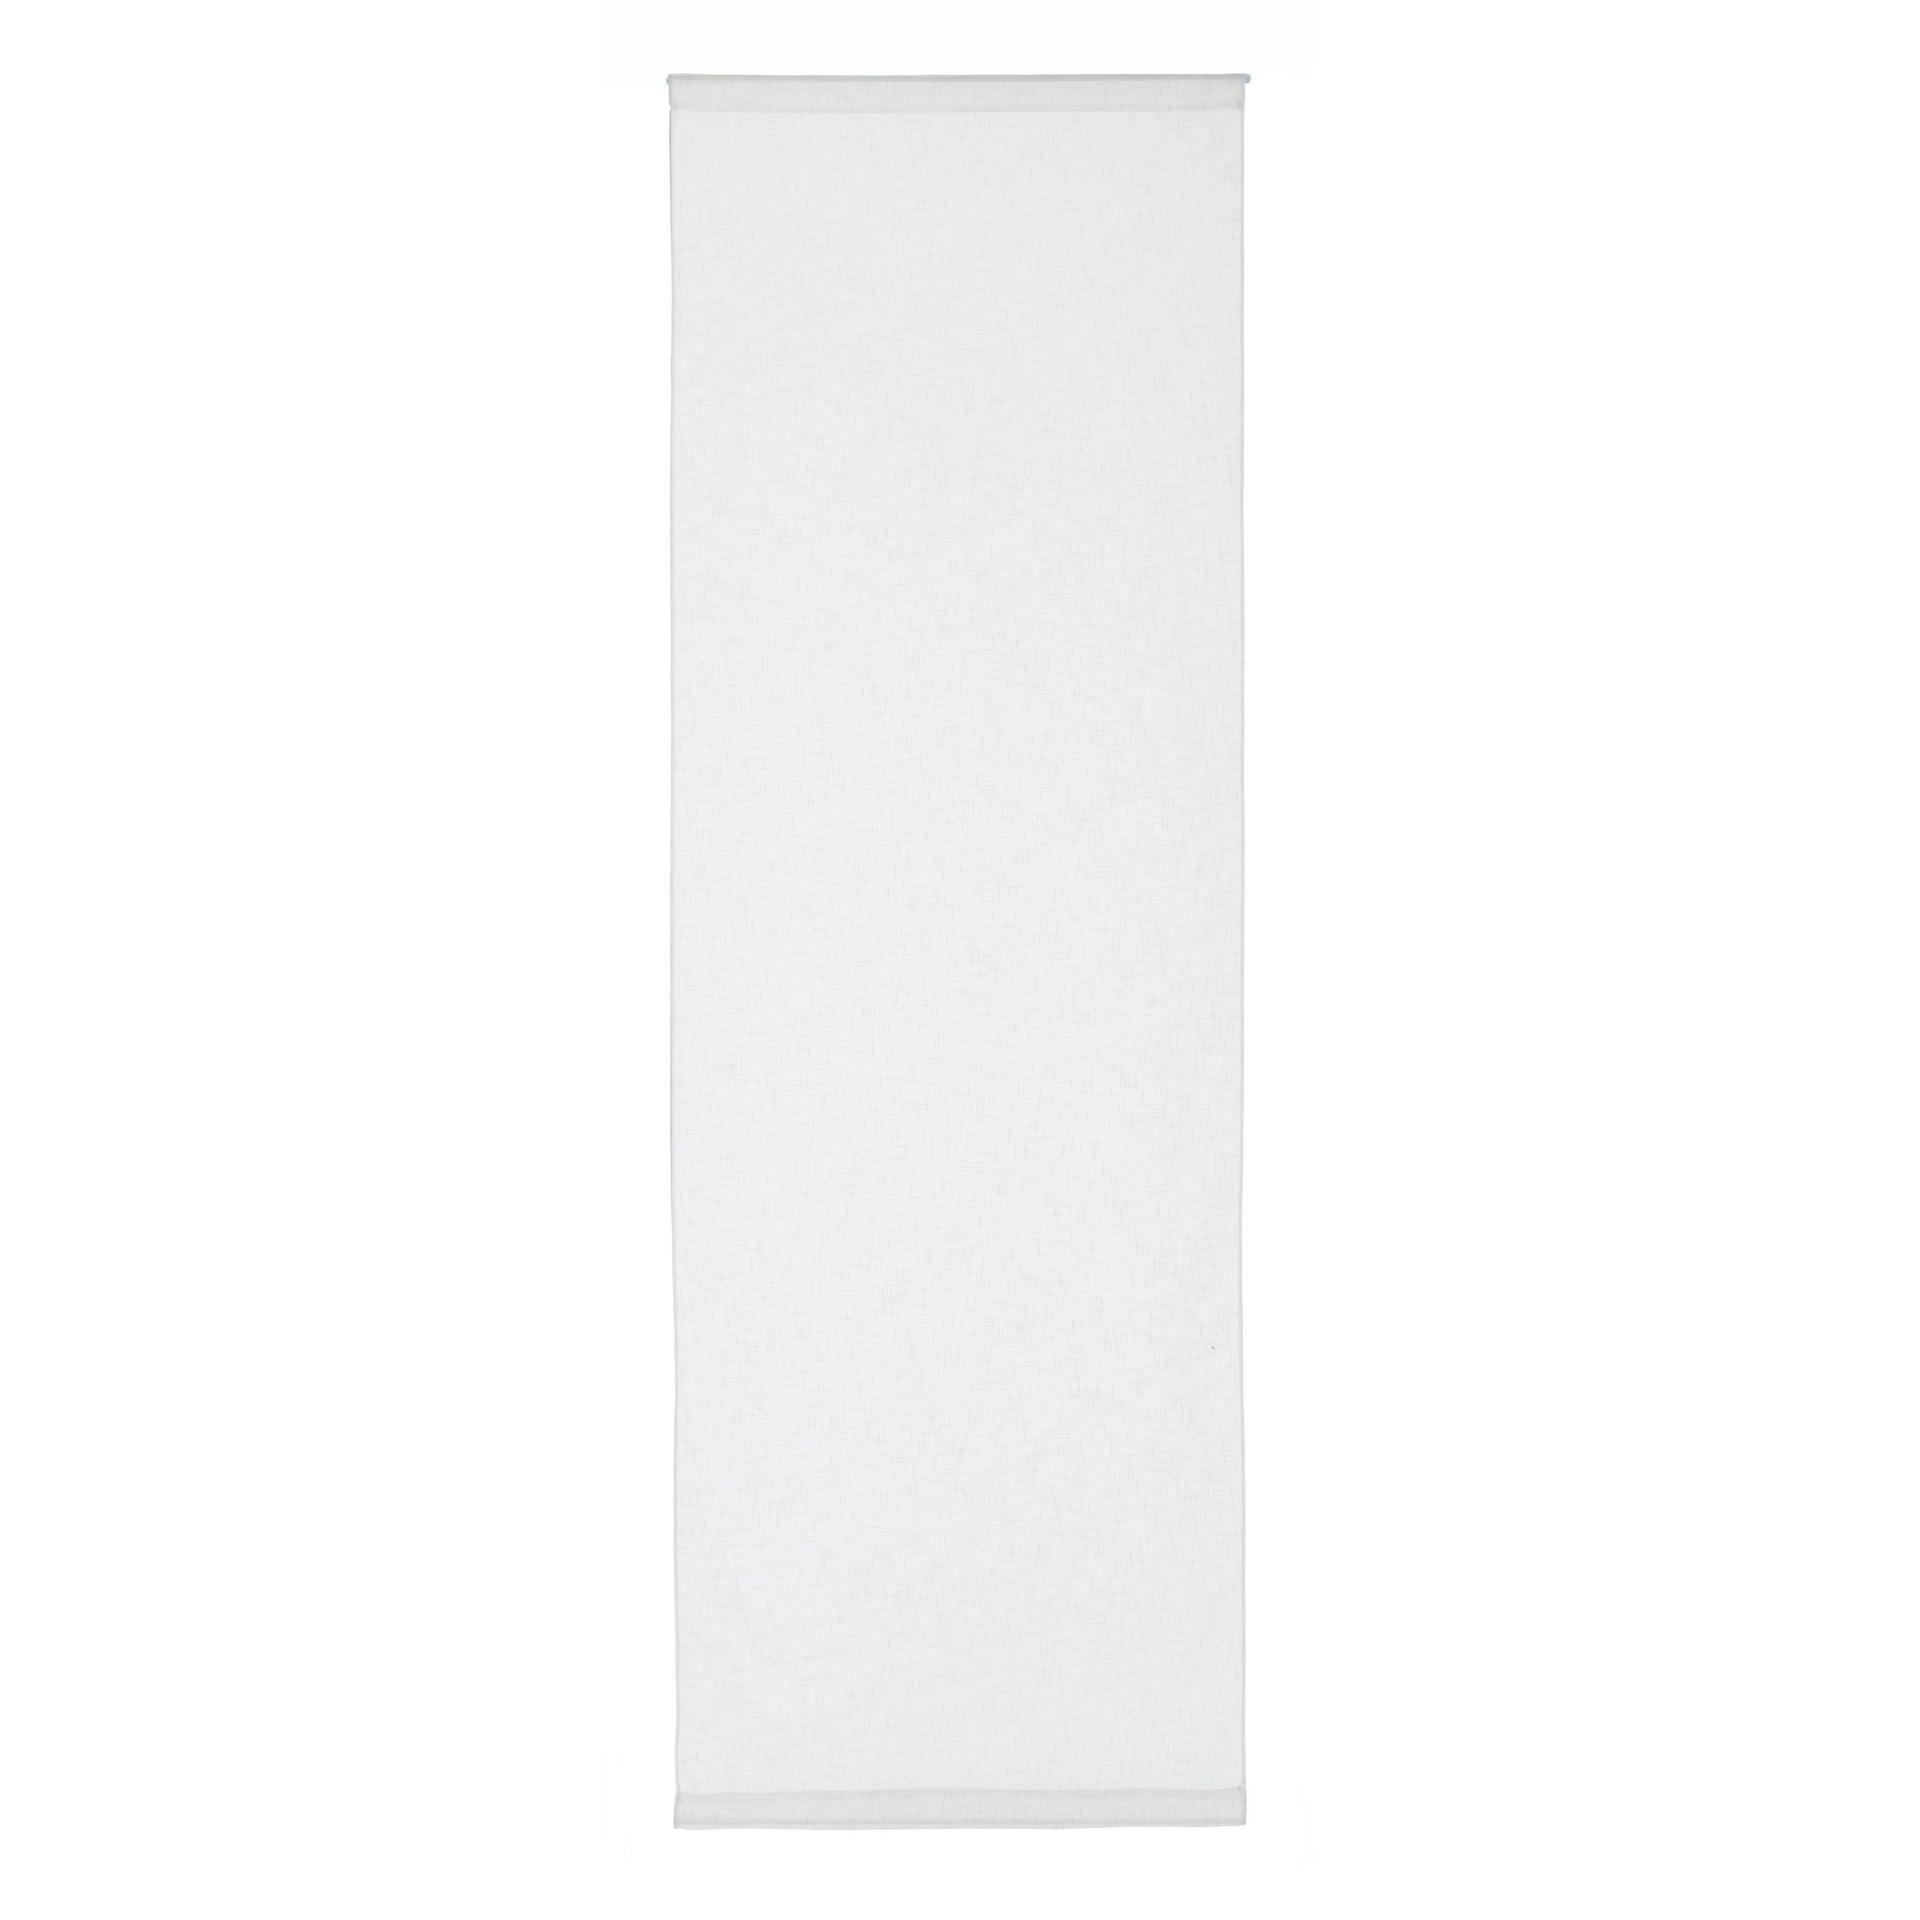 Tendina vetro Manuela naturale tunnel 75 x 230 cm - 3